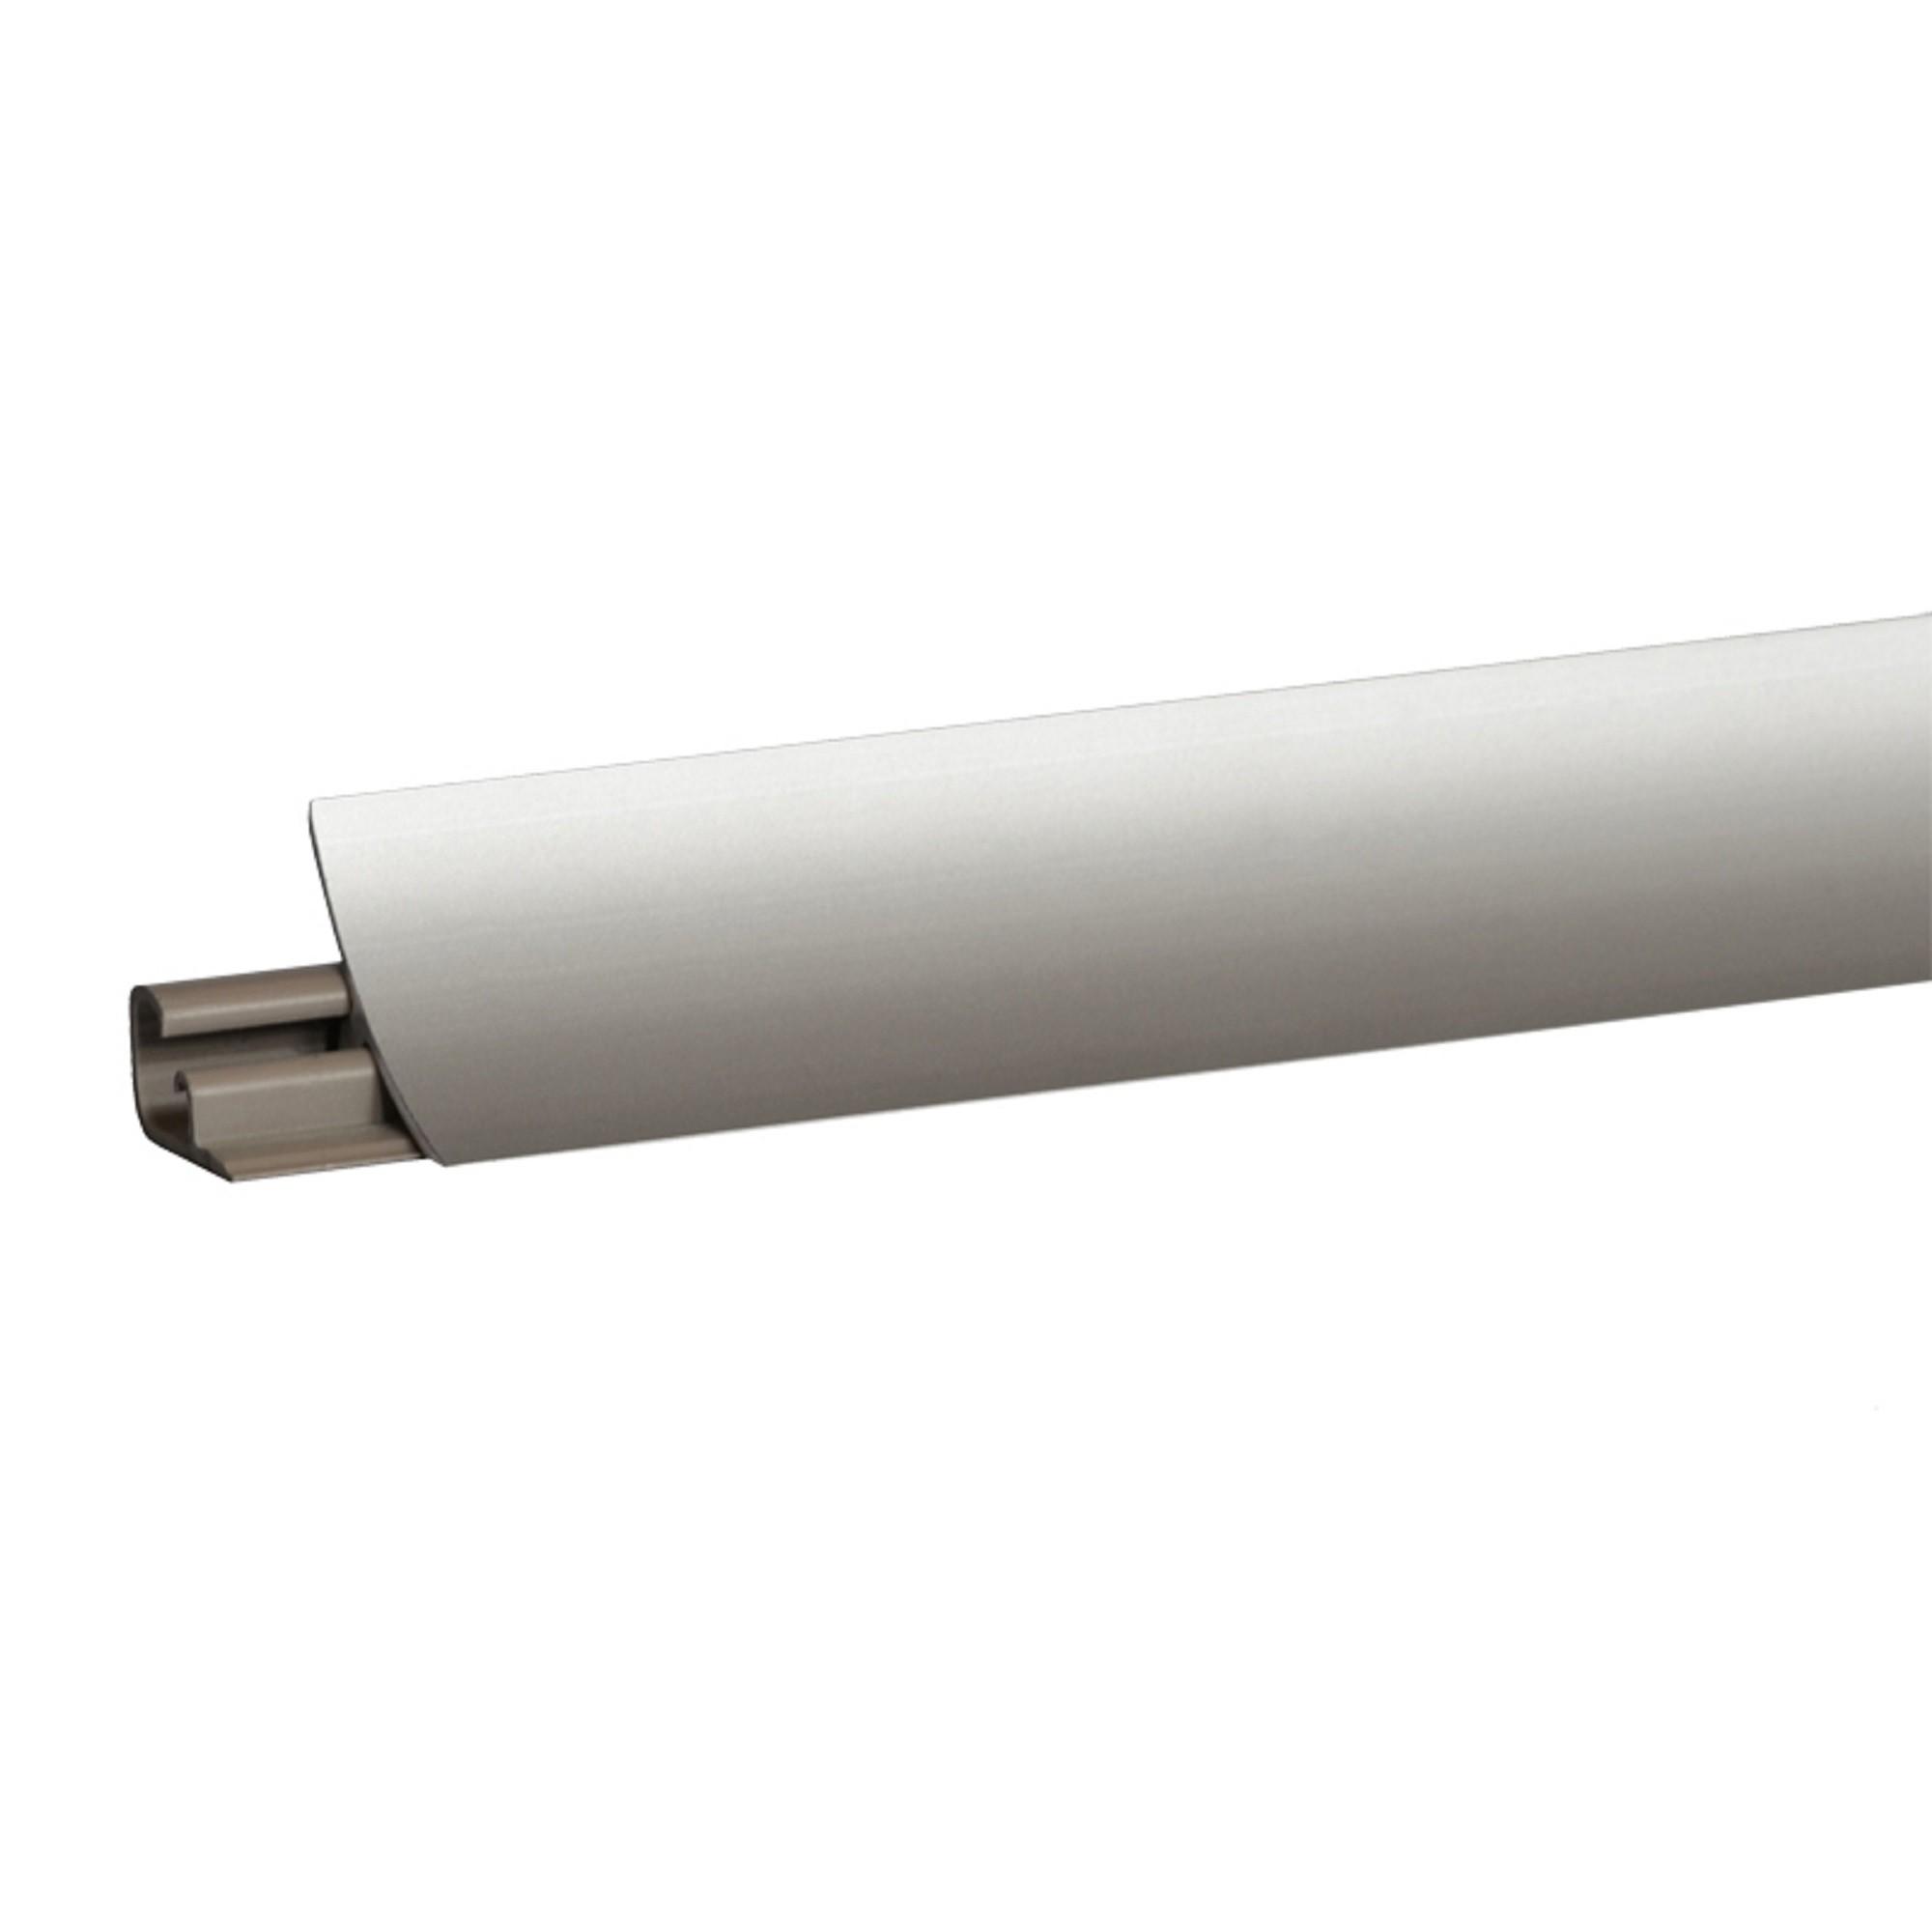 Dedeman Plinta Aluminiu Pentru Blat Bucatarie Lira Gri 23 Mm 3 M Dedicat Planurilor Tale